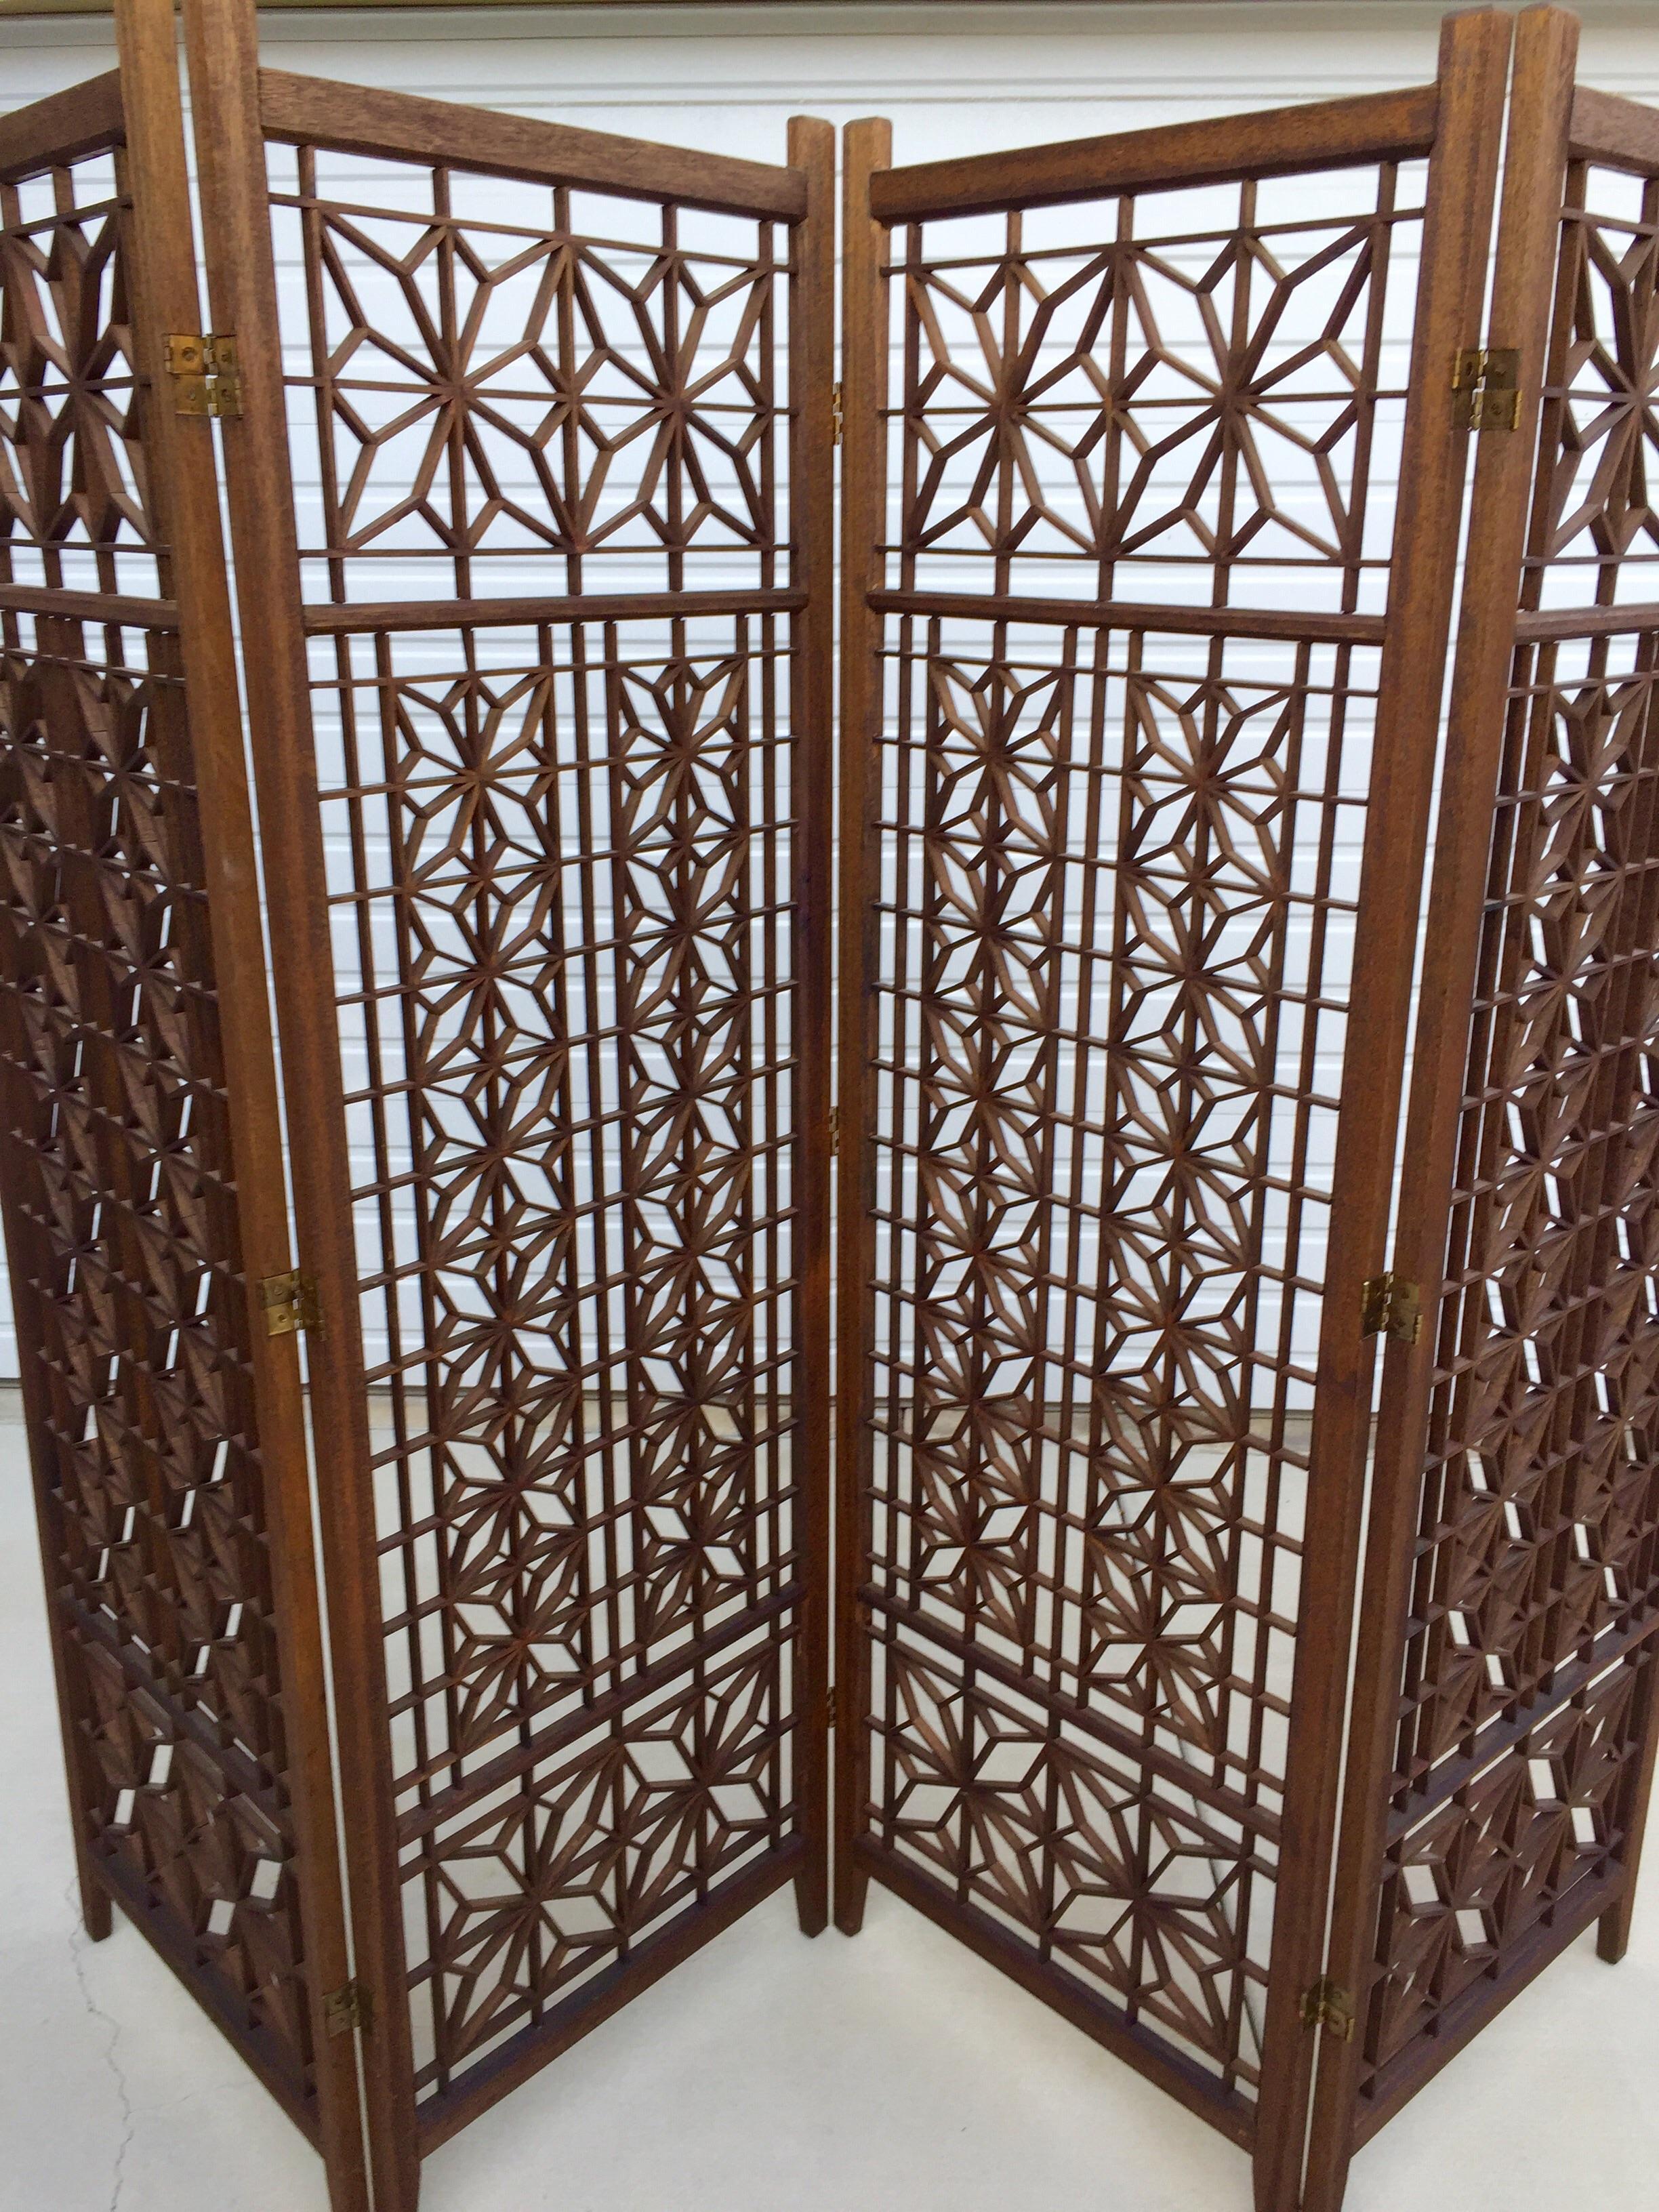 Geometric Wood Room Divider Screen   Image 5 Of 5